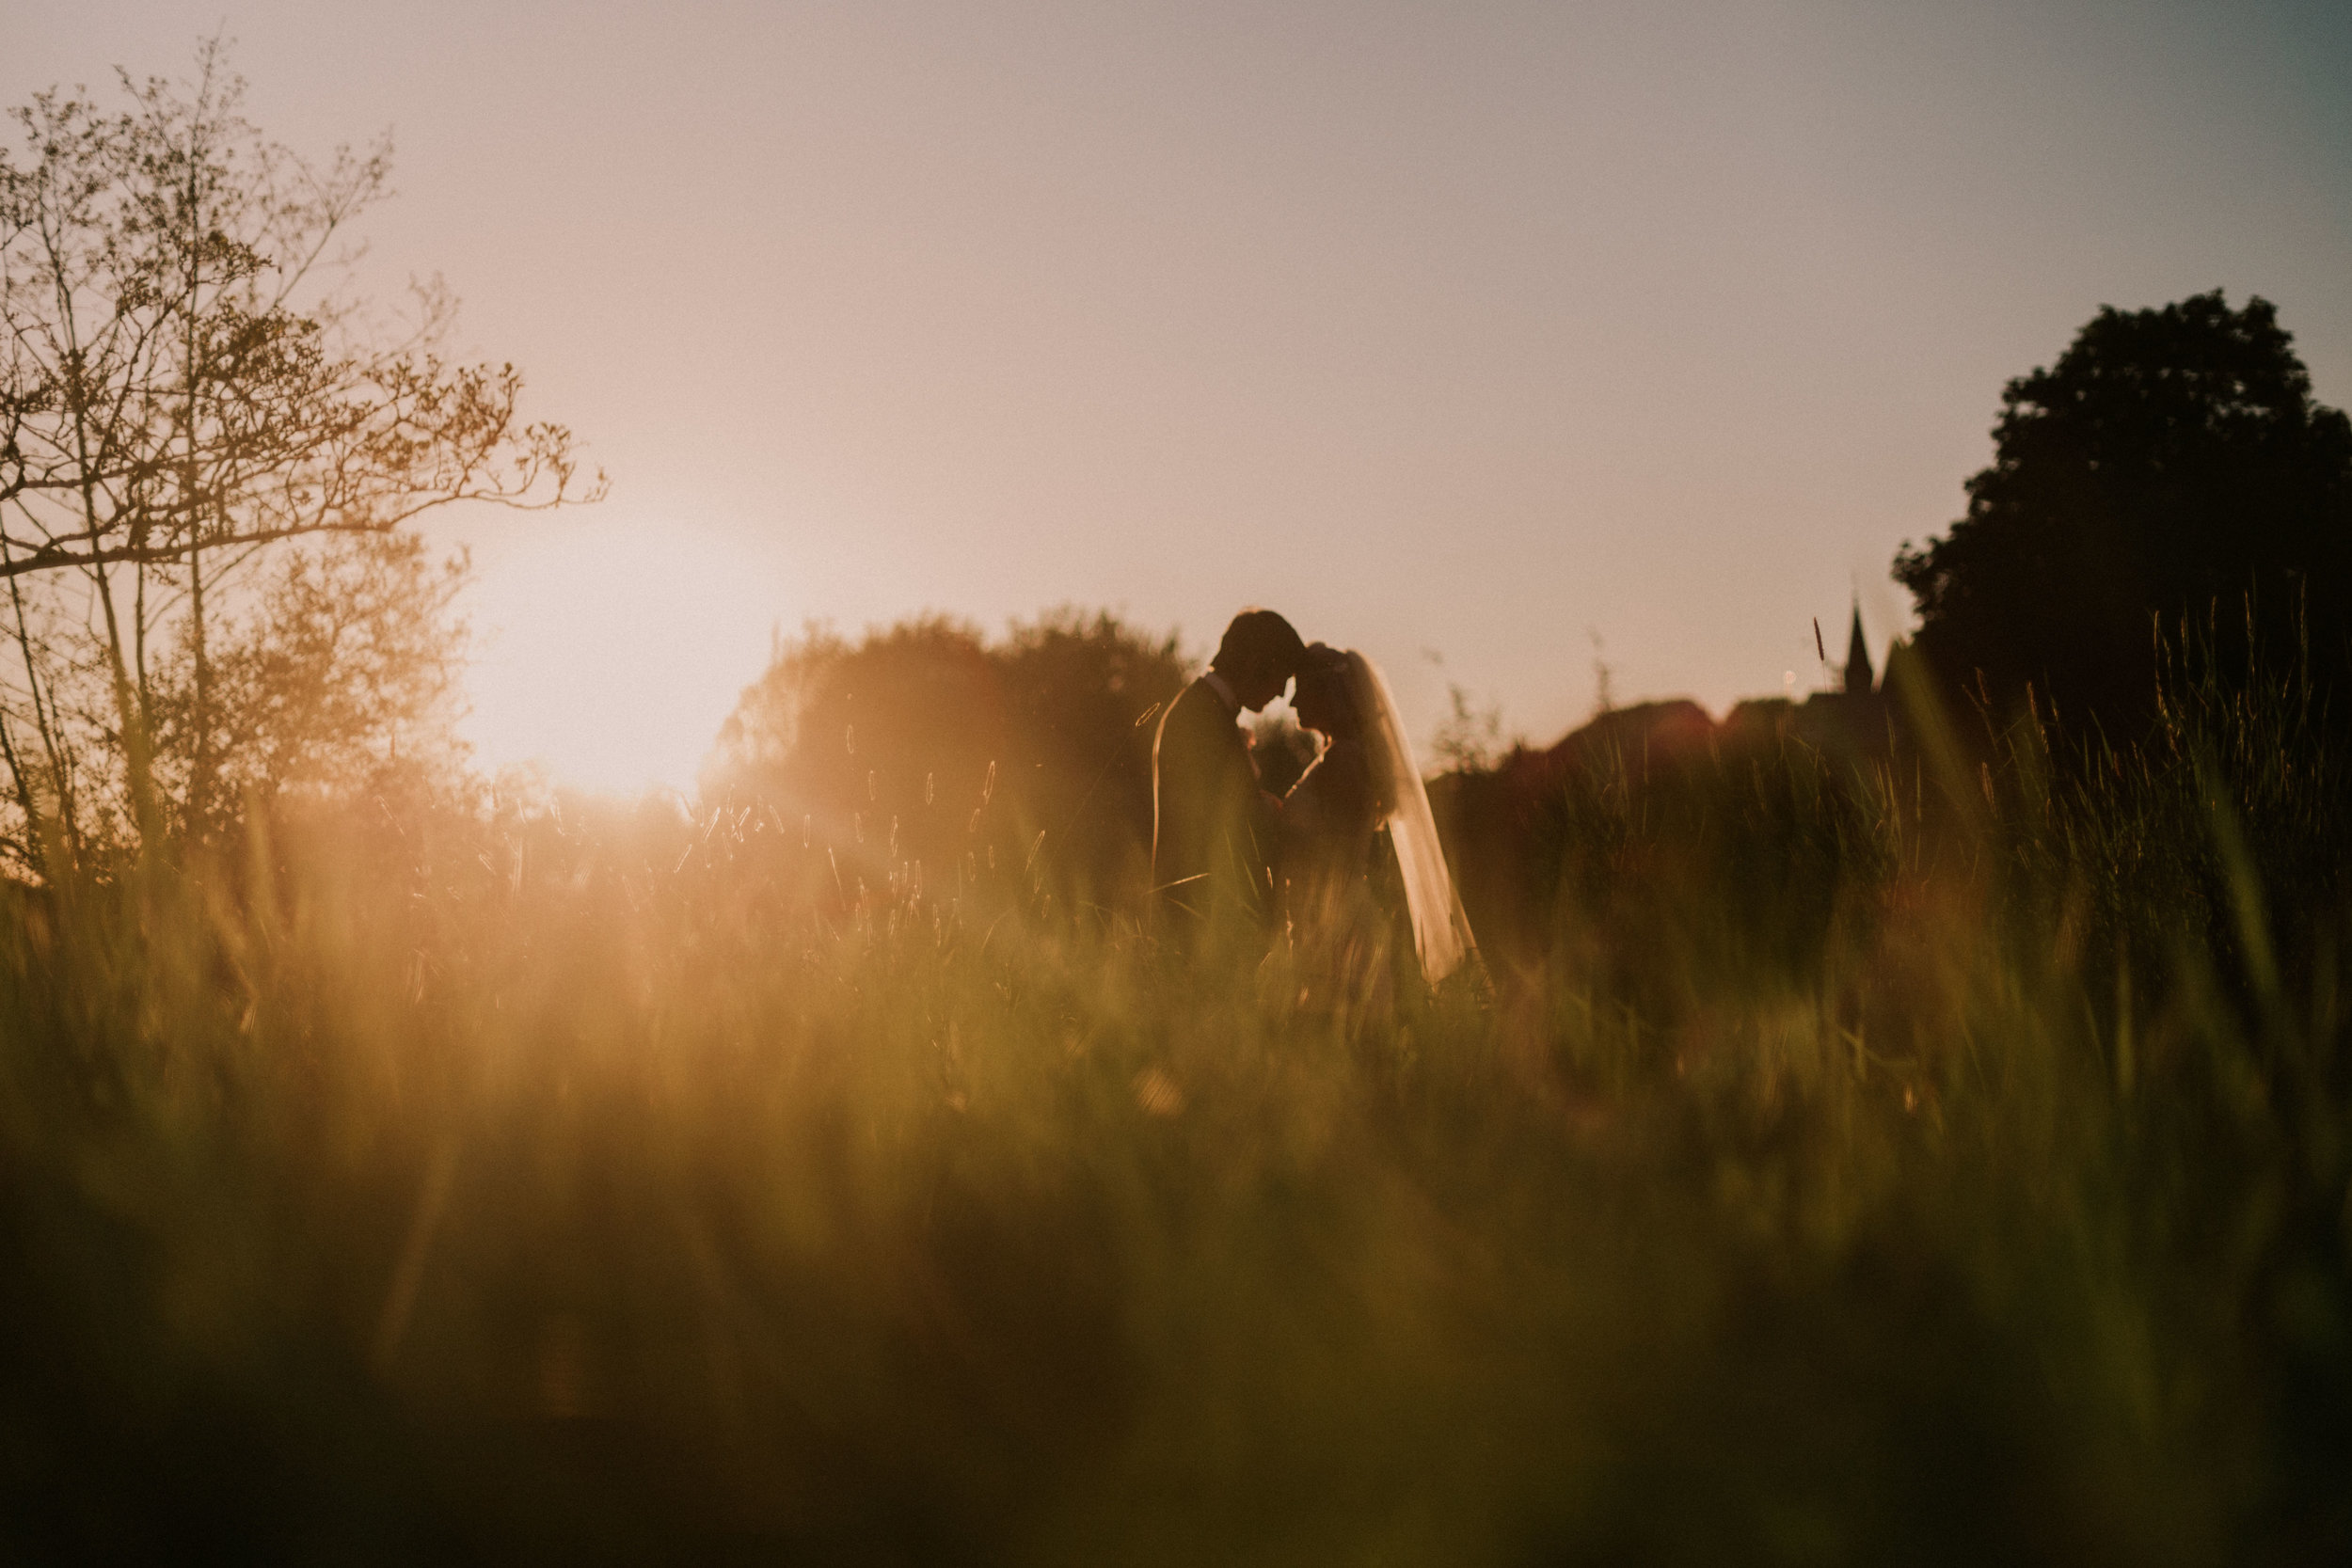 wedding+film,+wedding+video,+wedding+videographer+london,+wedding+film+london,+richmond+wedding+videographer,+richmond+wedding+film,+destination+wedding+film,+destination+wedding+videographer,+london+wedding+videographer,+london+wedding+ci